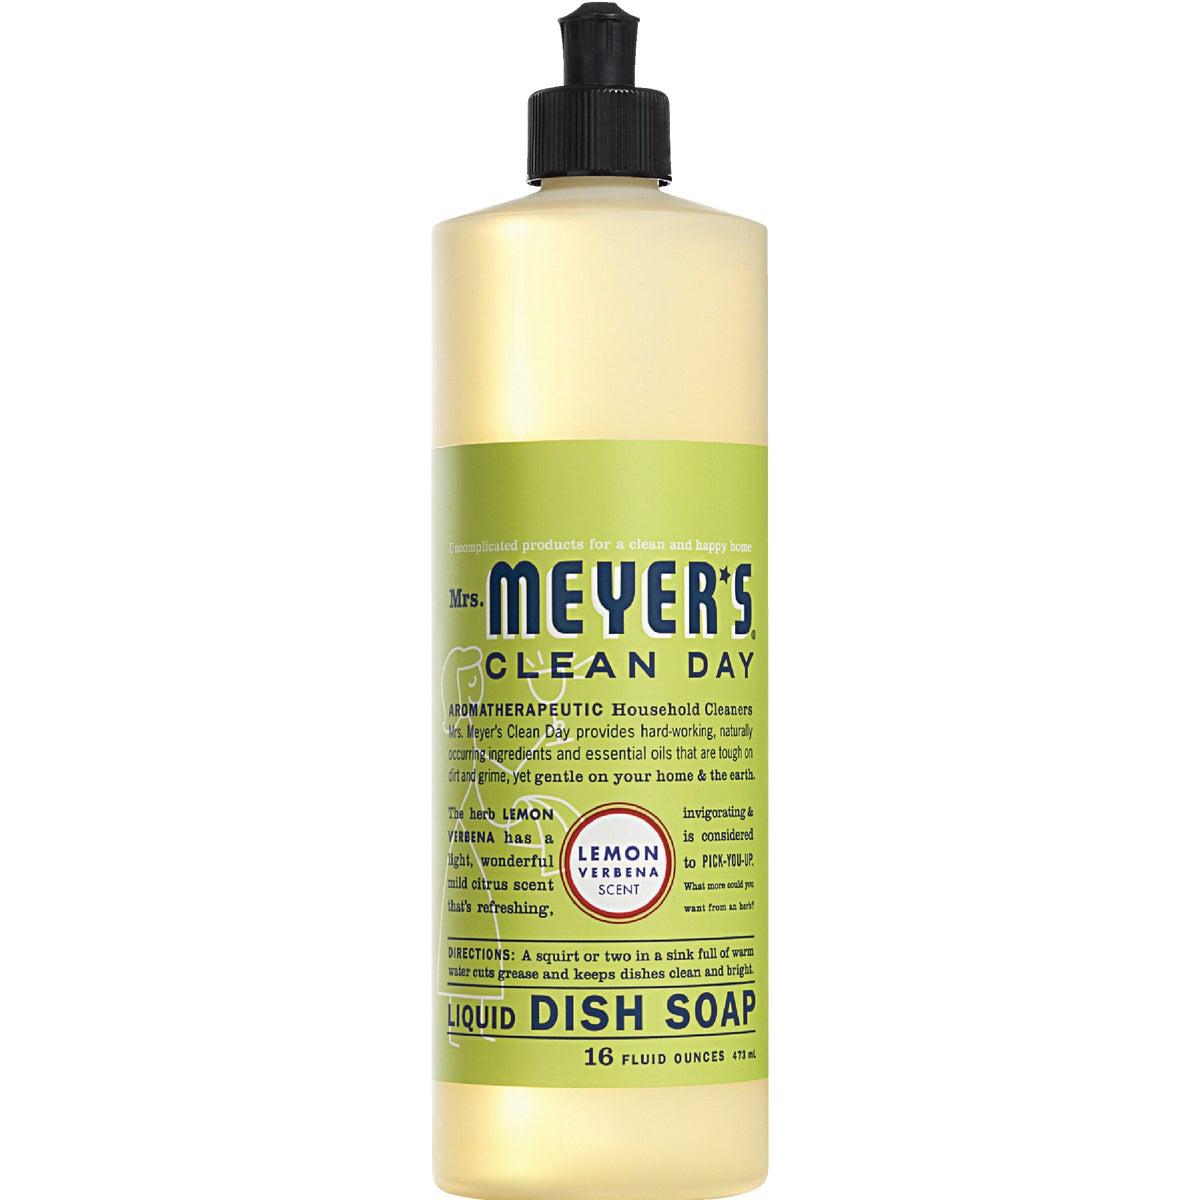 Mrs Meyers Clean Day LEMON LIQ DISH SOAP 12103